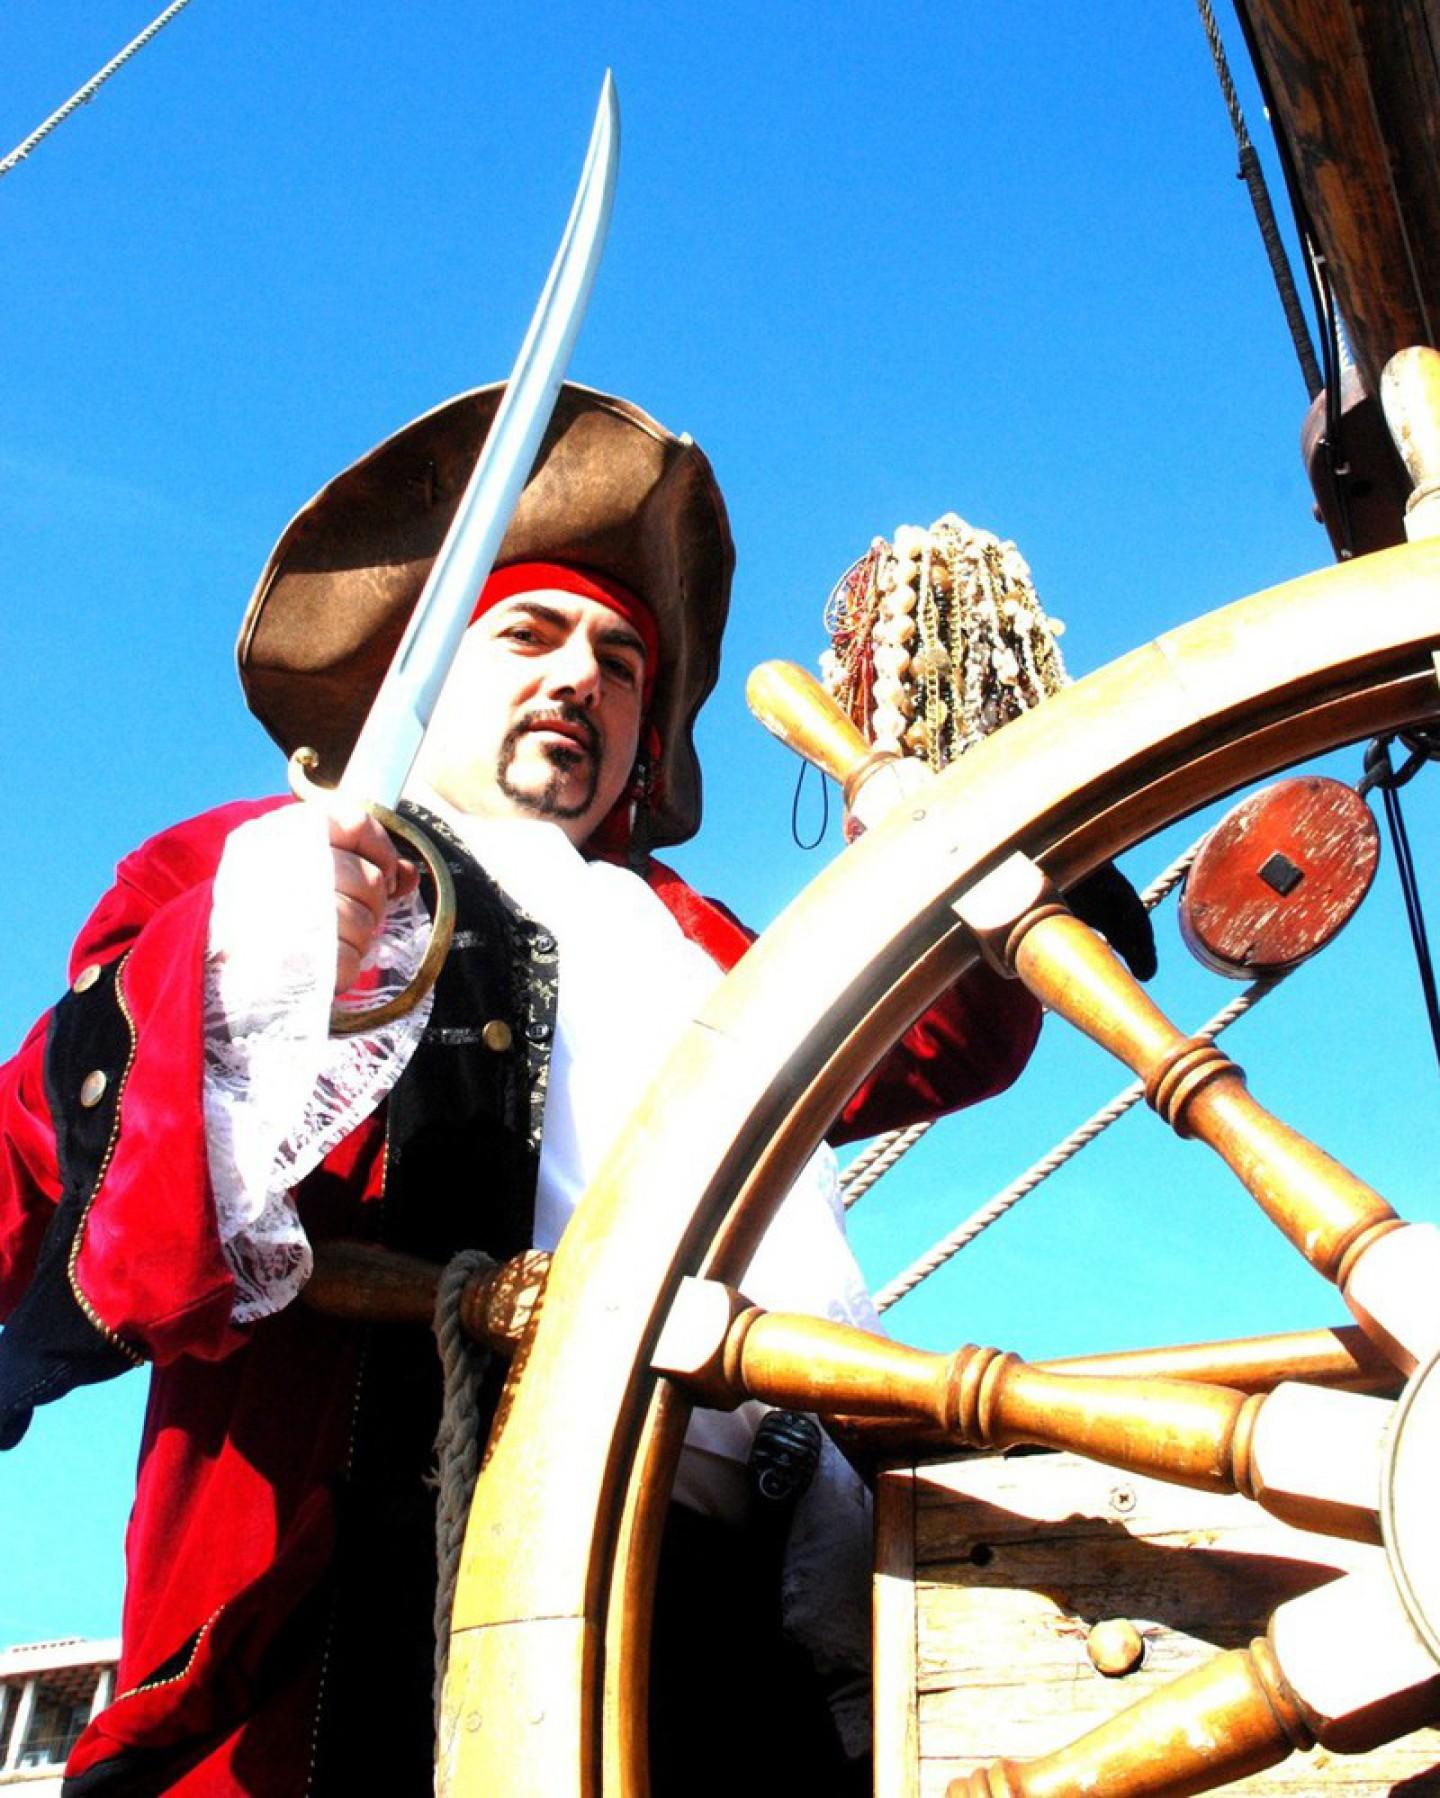 Pirate magicien à Marseille France, Fabrizio le magicien pirate des enfants à Marseille, fabrizio le pirate magicien des enfants à Marseille bouches du rhône France